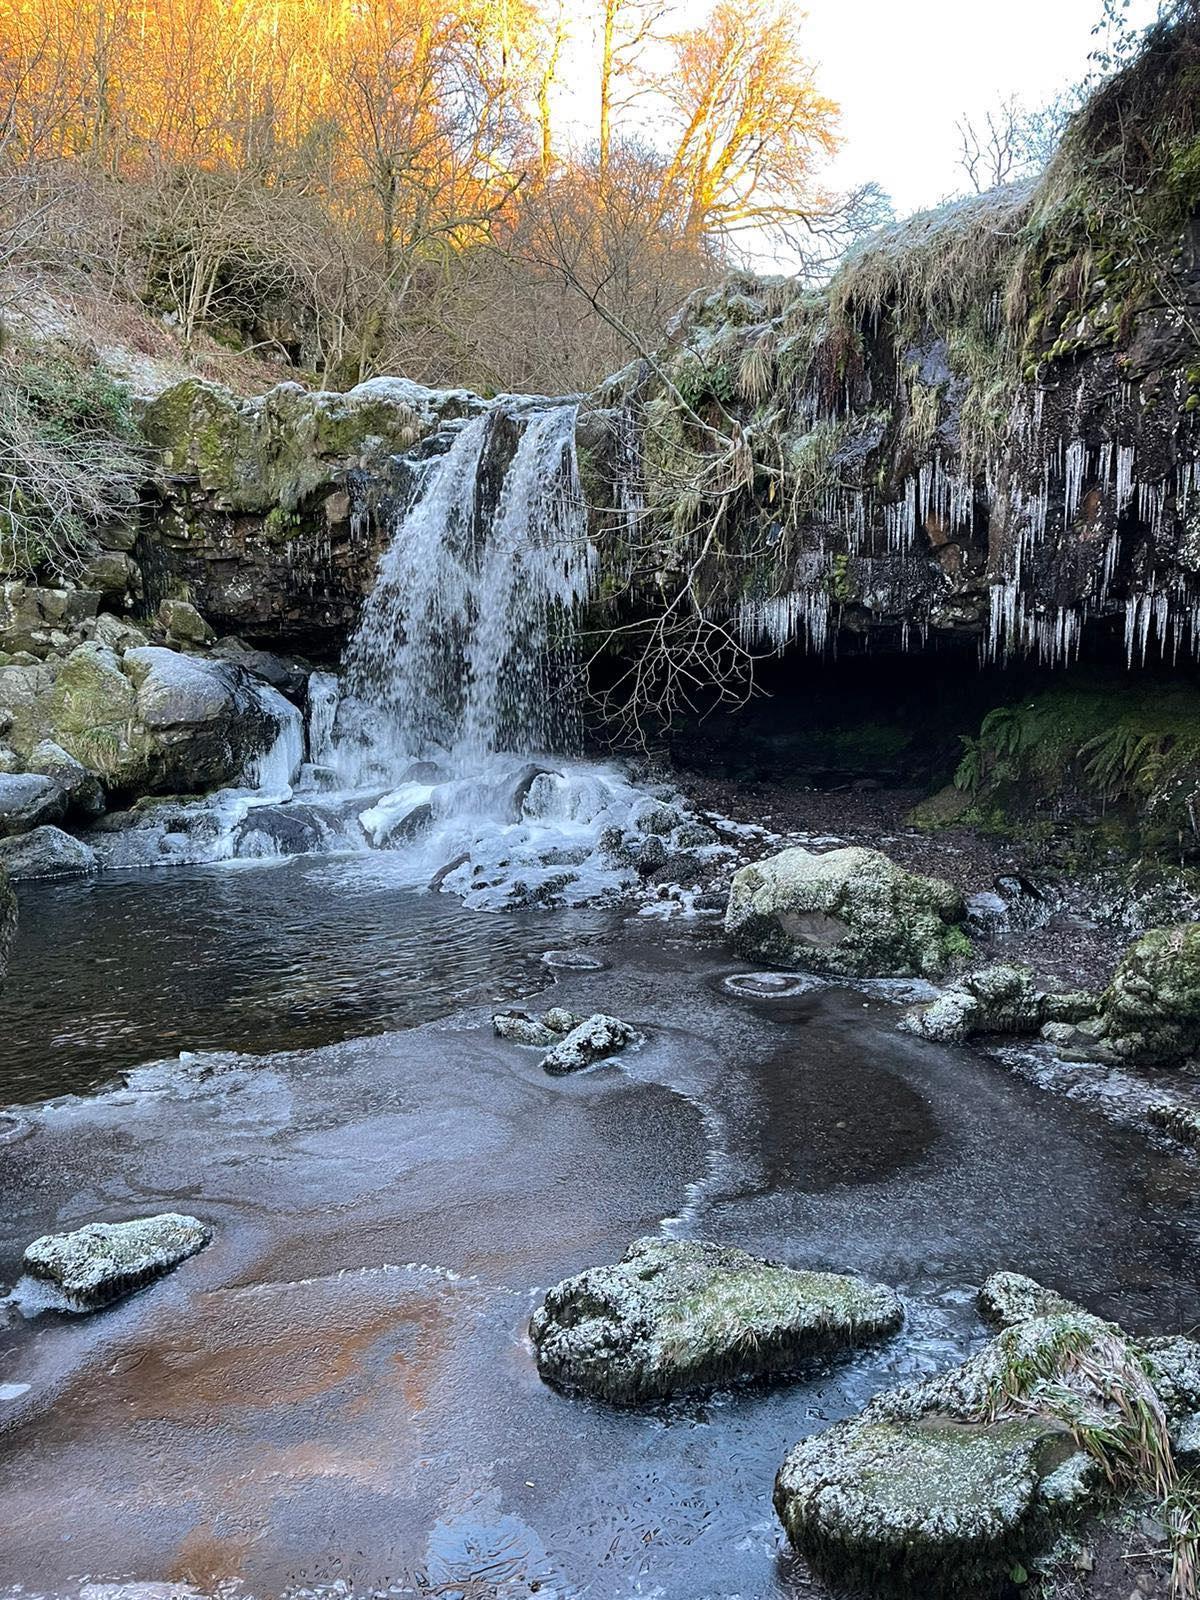 Frozen Waterfall at Campsie Fells